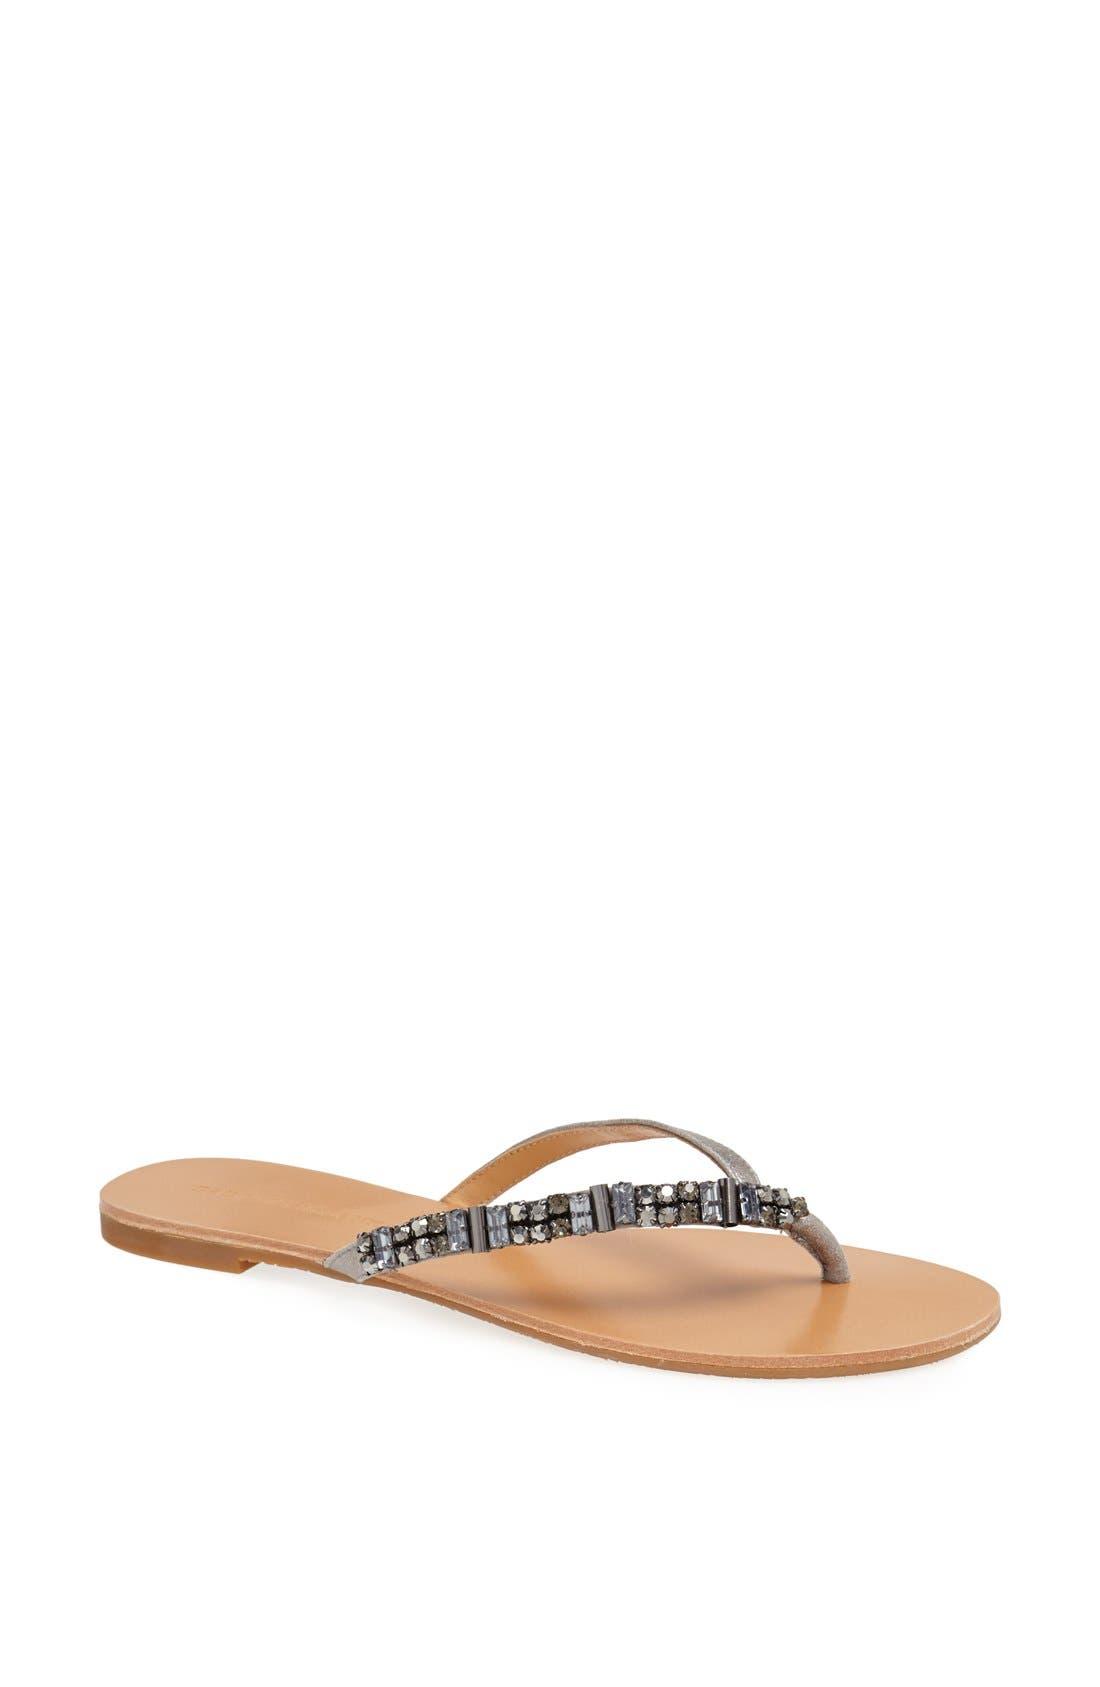 Main Image - Badgley Mischka 'Kamryn' Thong Sandal